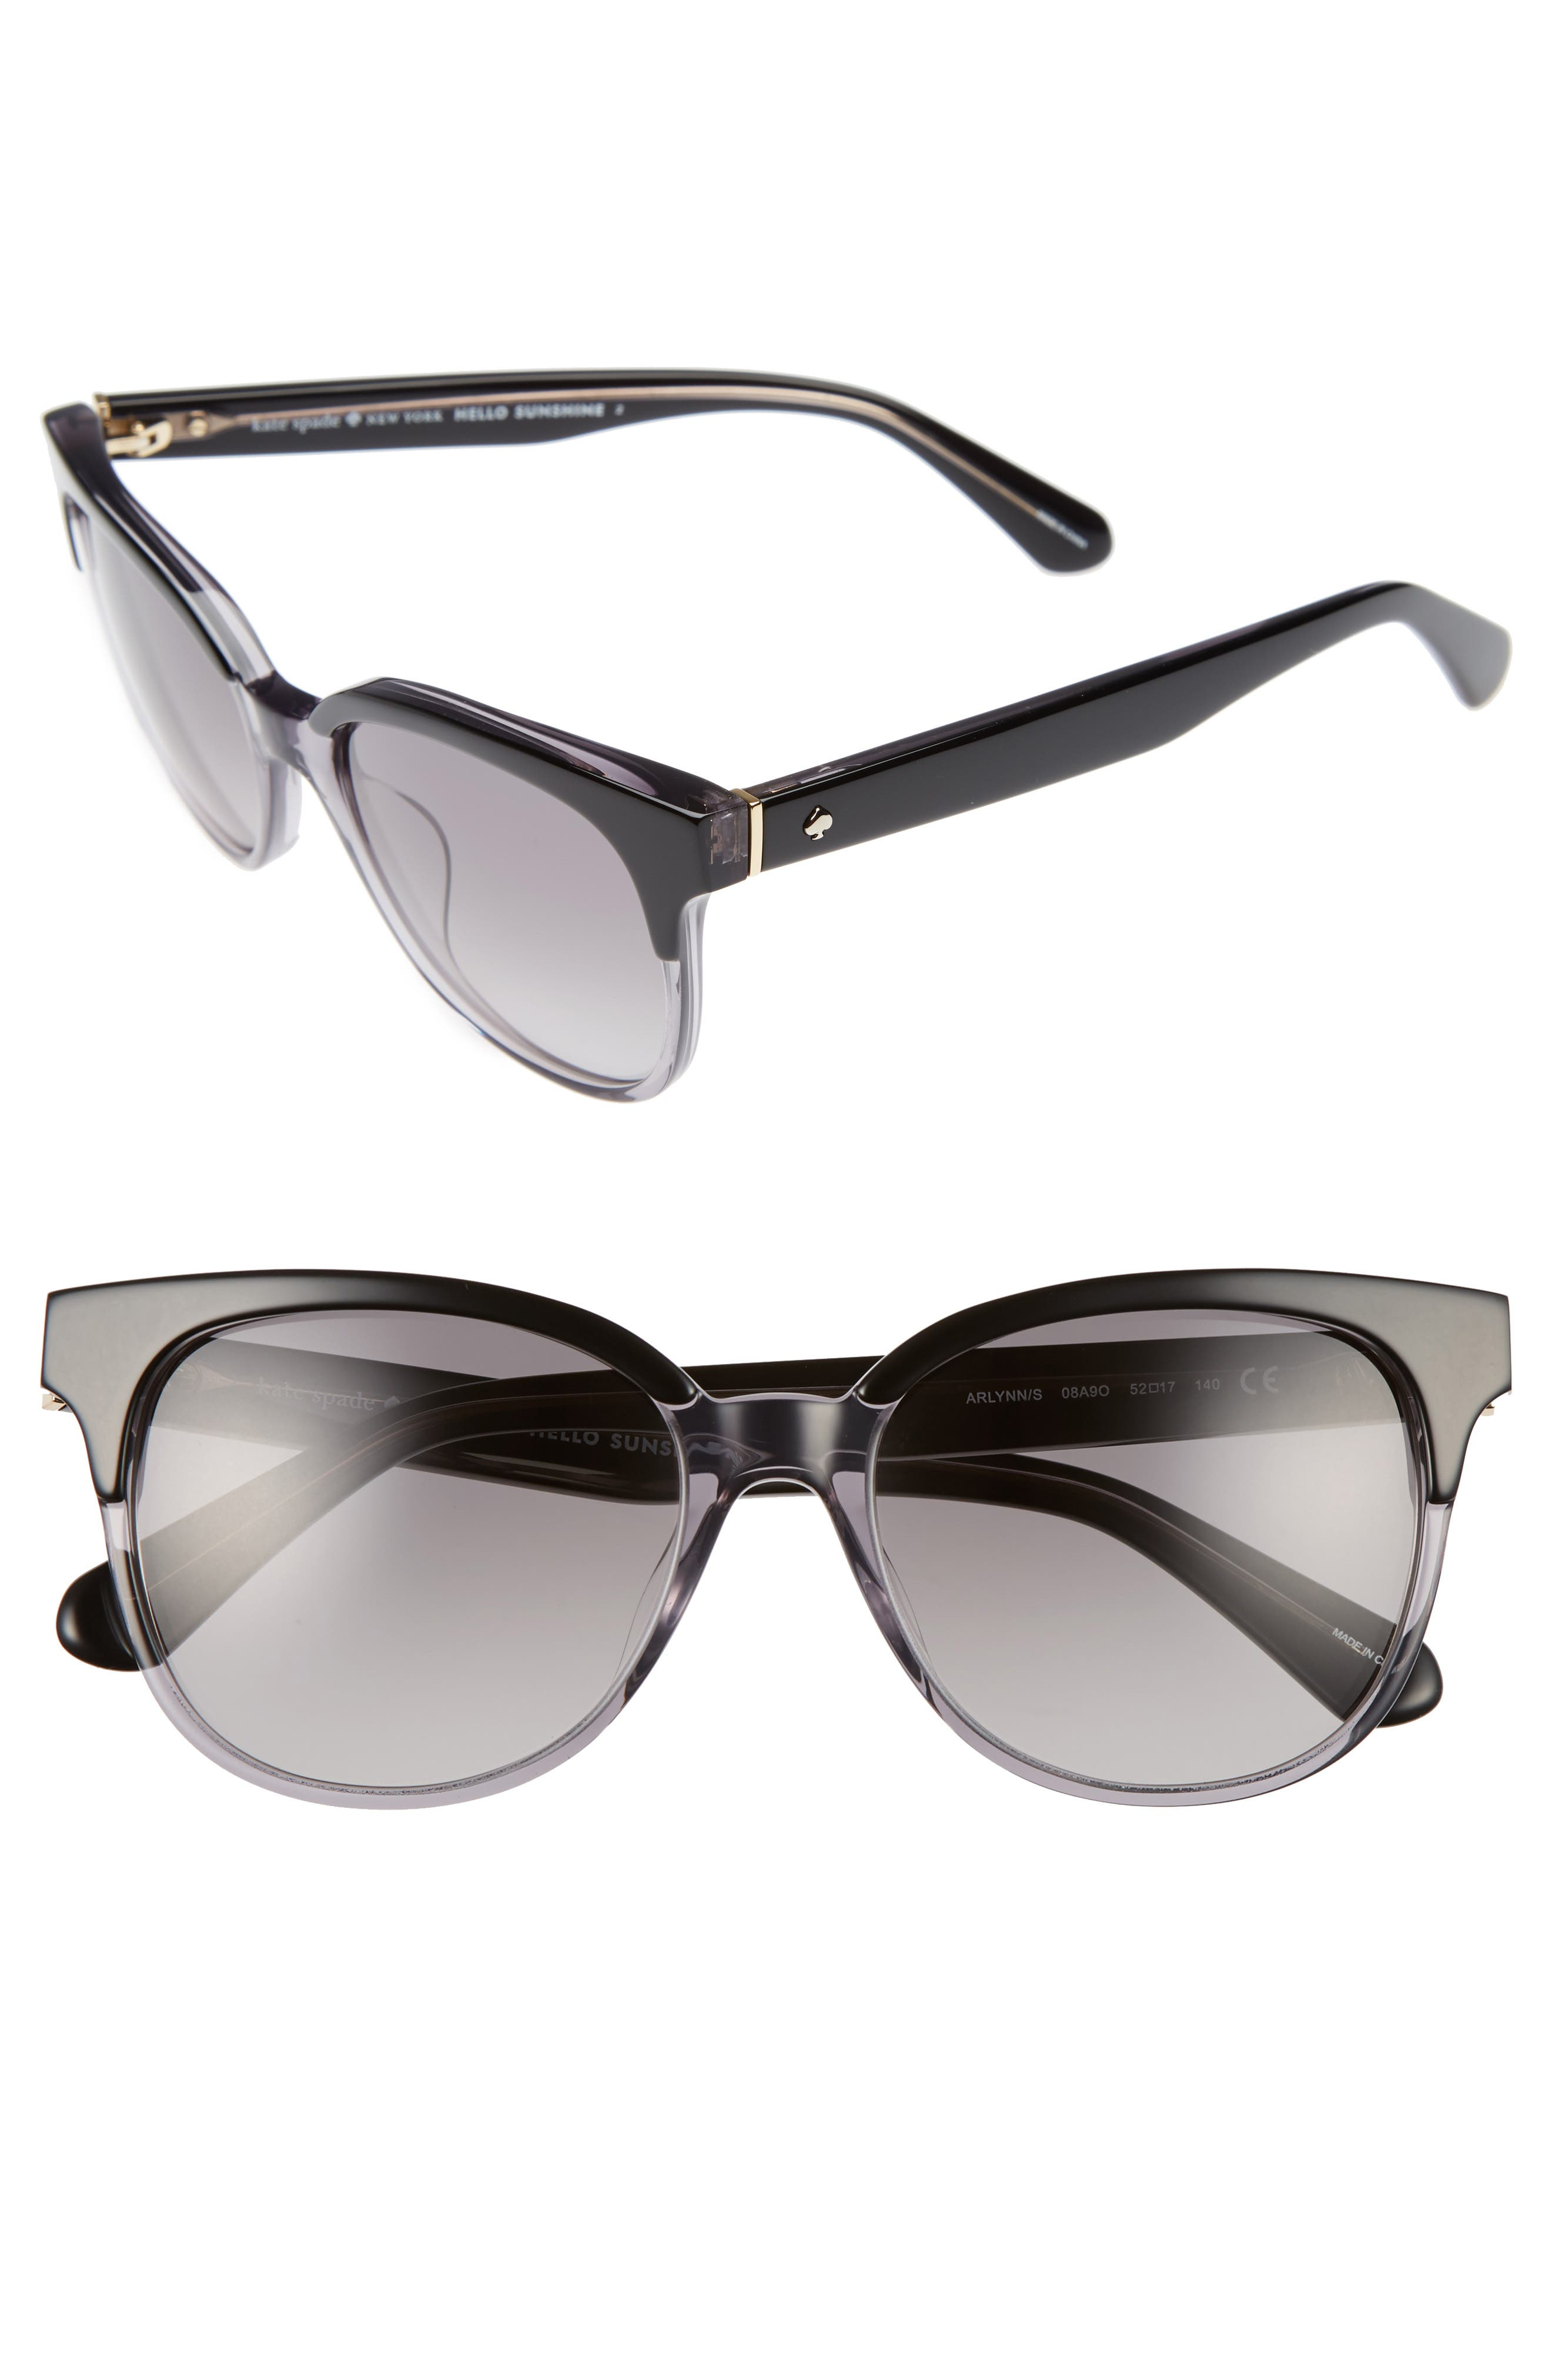 Alternate Image 1 Selected - kate spade new york arlynn 52mm Sunglasses